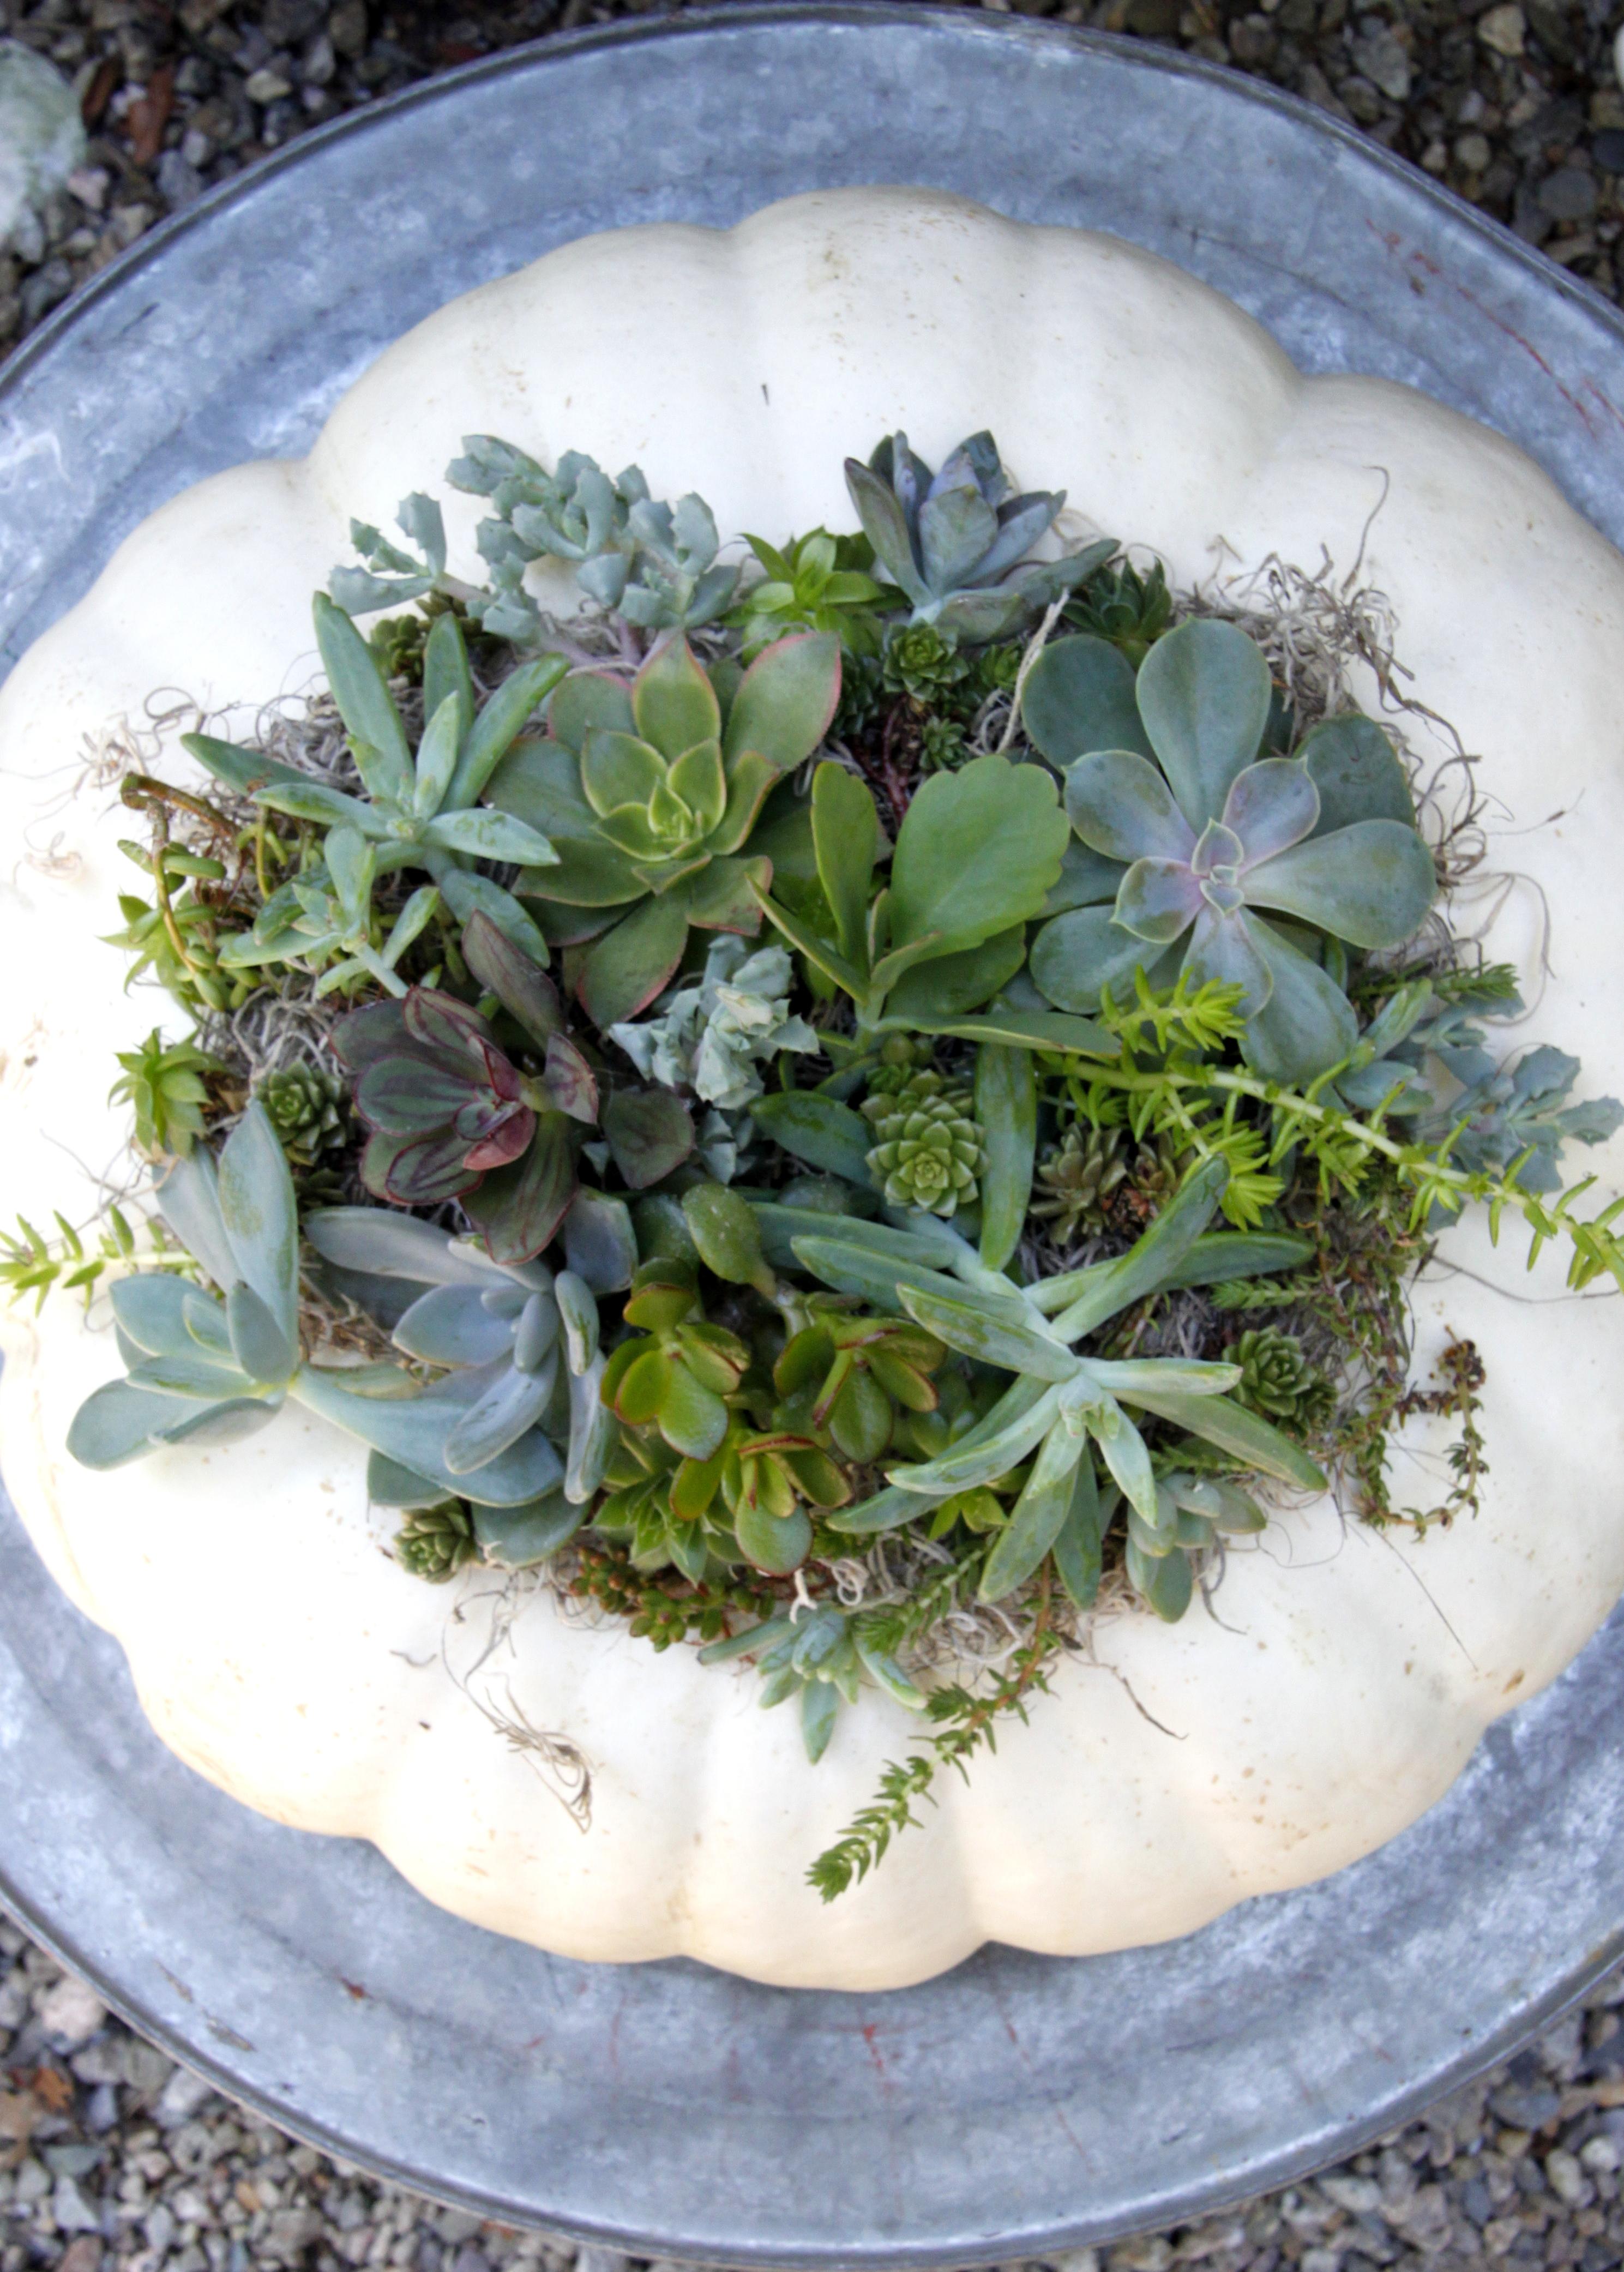 original_caughey-melissa-succulent-pumpkin-13 succulent topped pumpkins